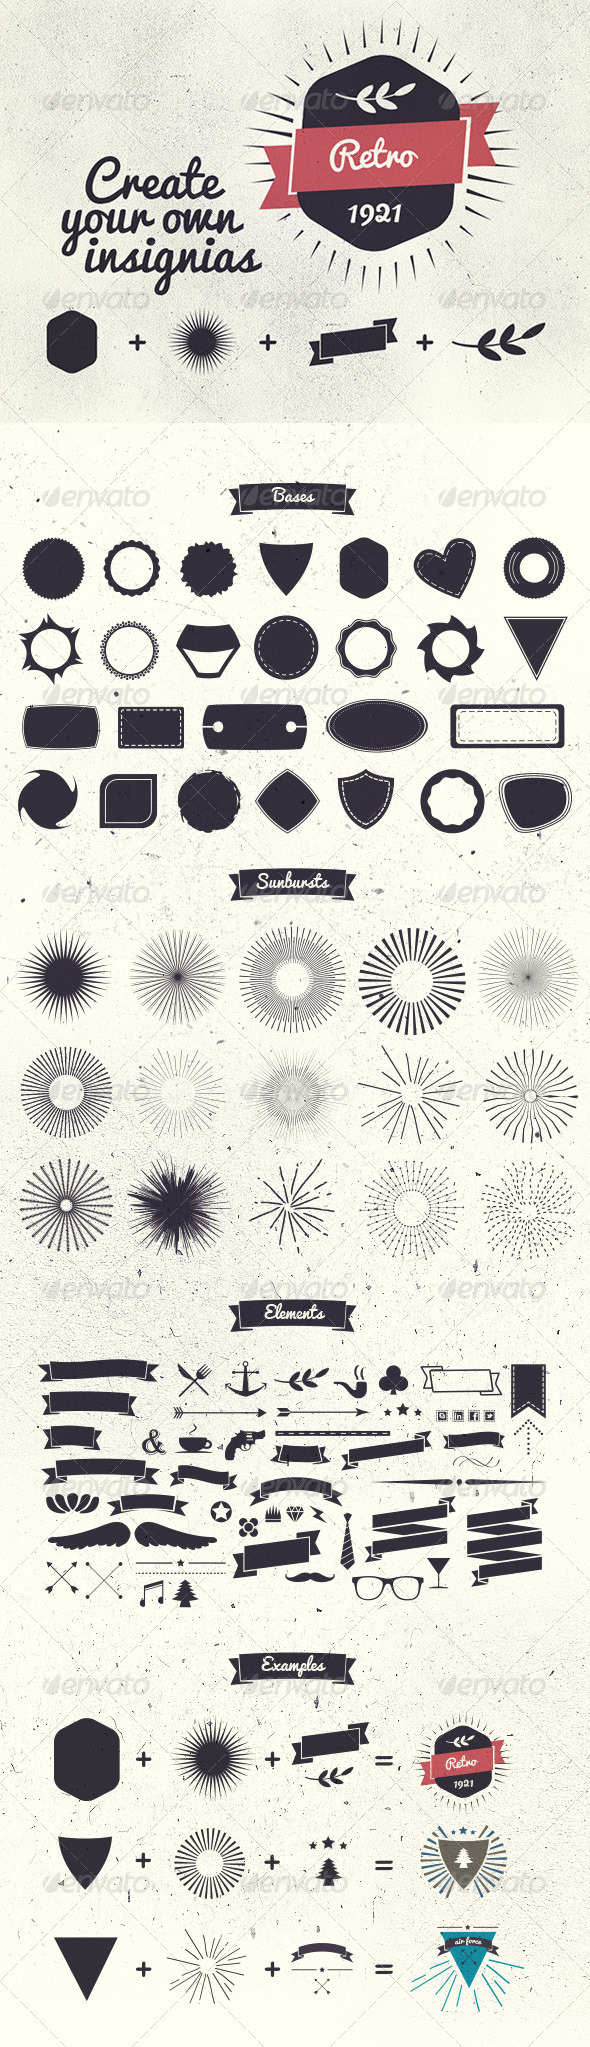 GraphicRiver Badge Creator Kit 6563620